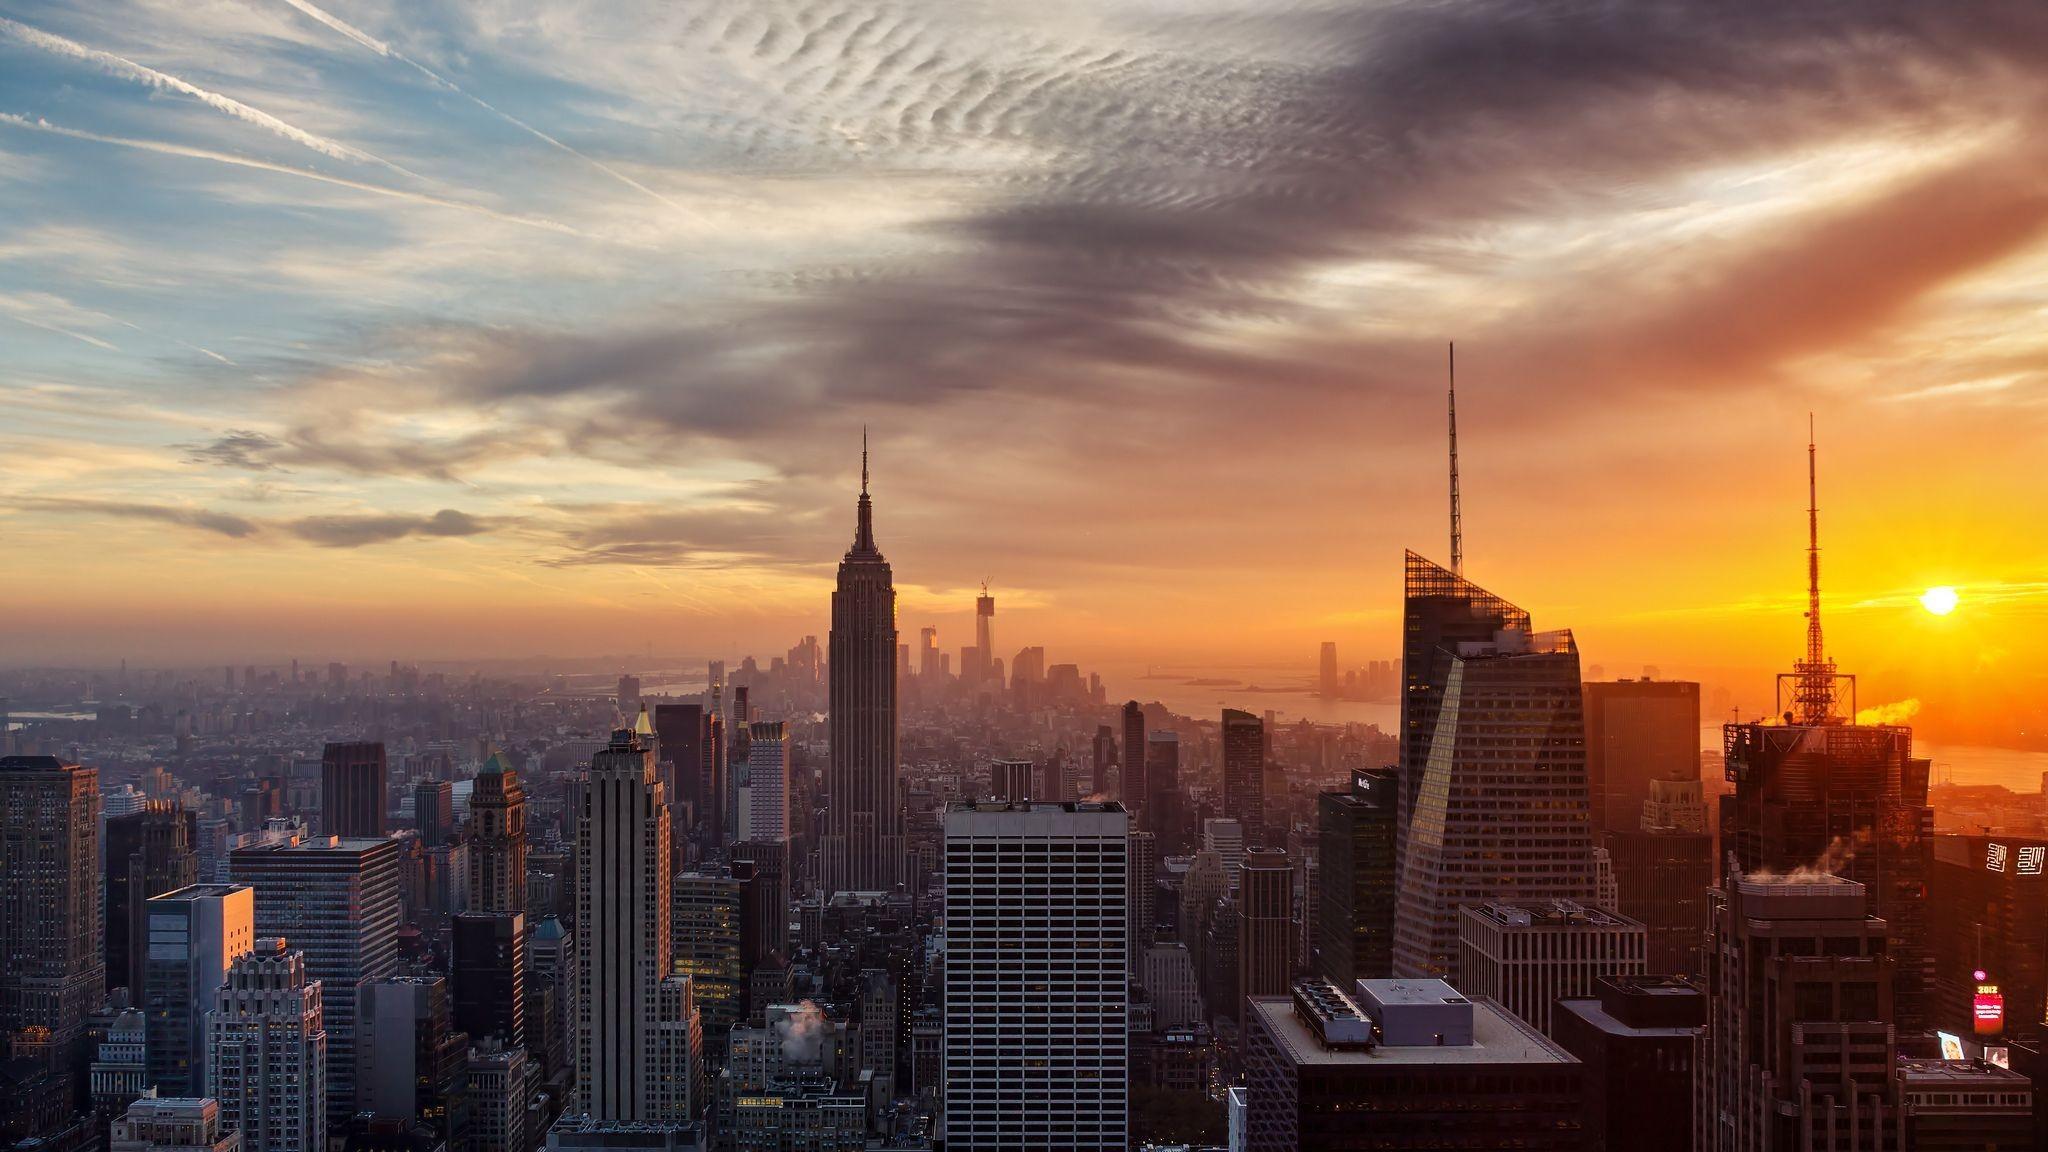 New York City Winter Sunset Wallpapers